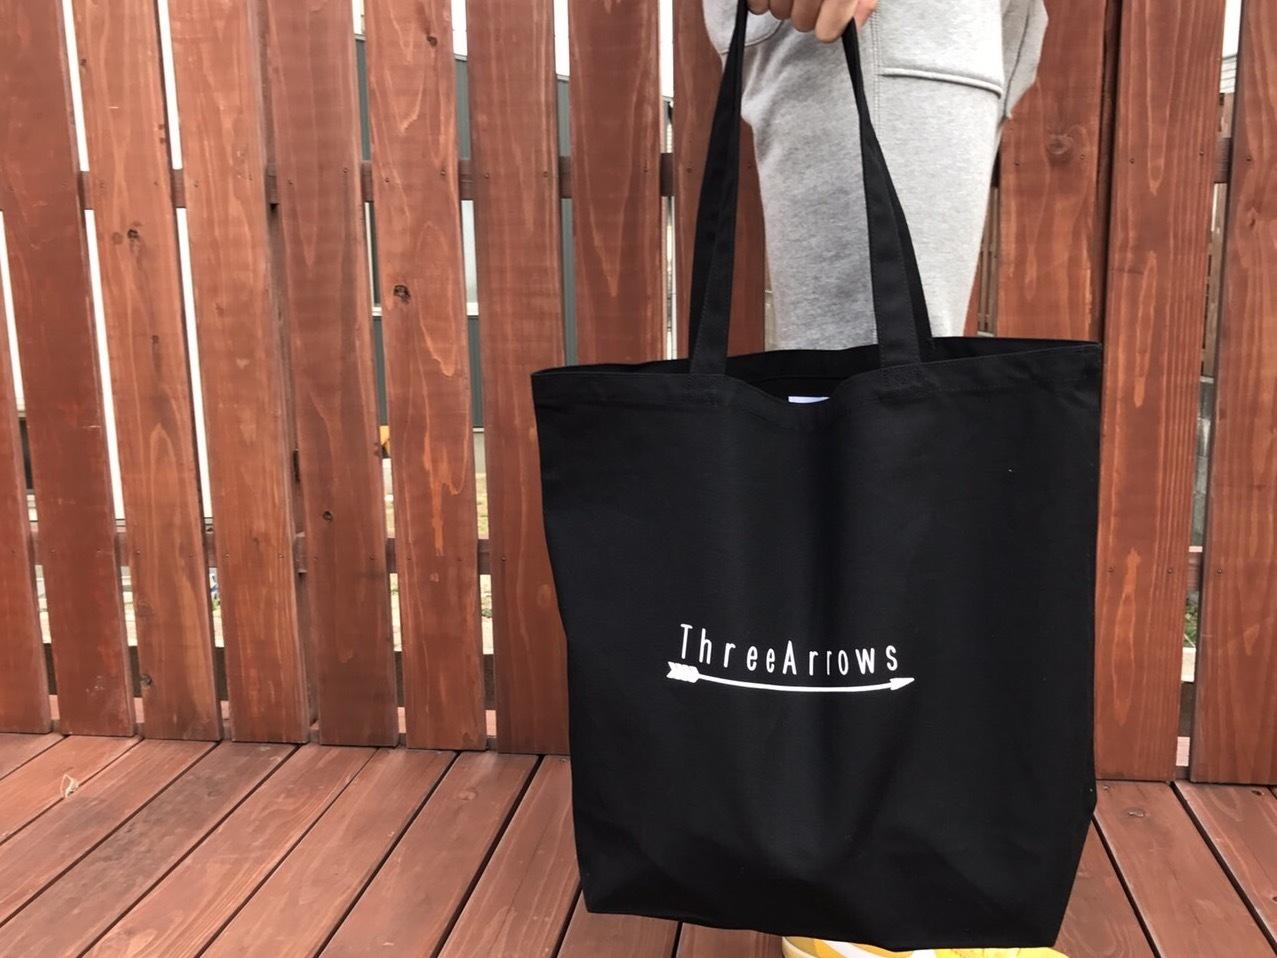 ThreeArrowsトートバック Mサイズ (black)